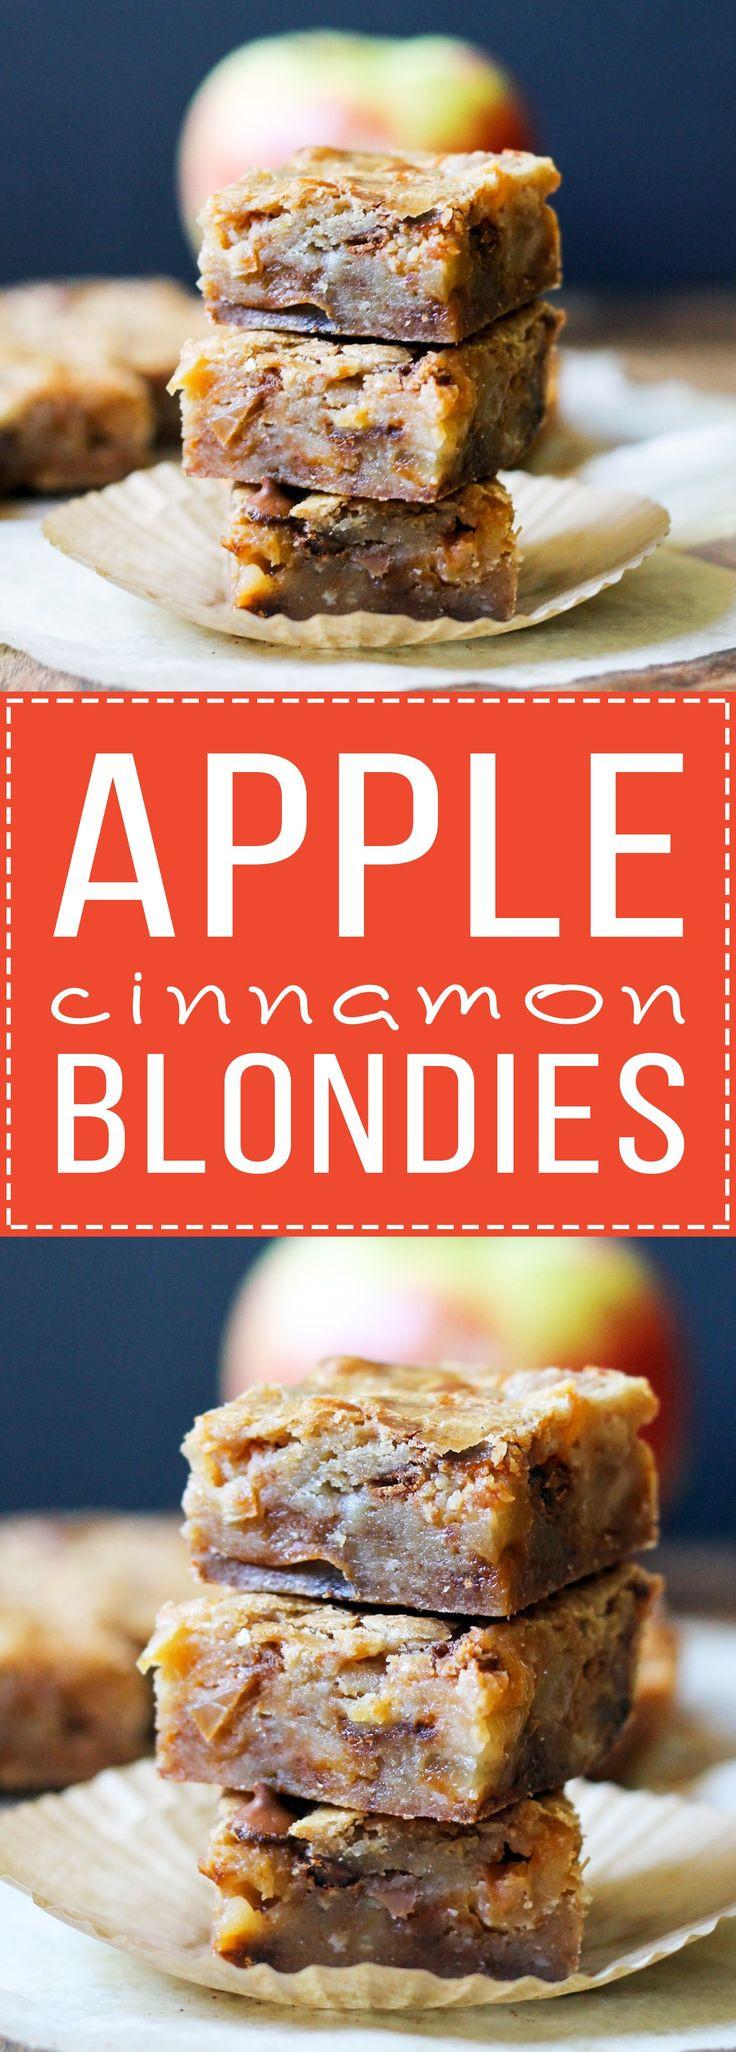 Healthy Fall Desserts  Best 25 Apple desserts ideas on Pinterest